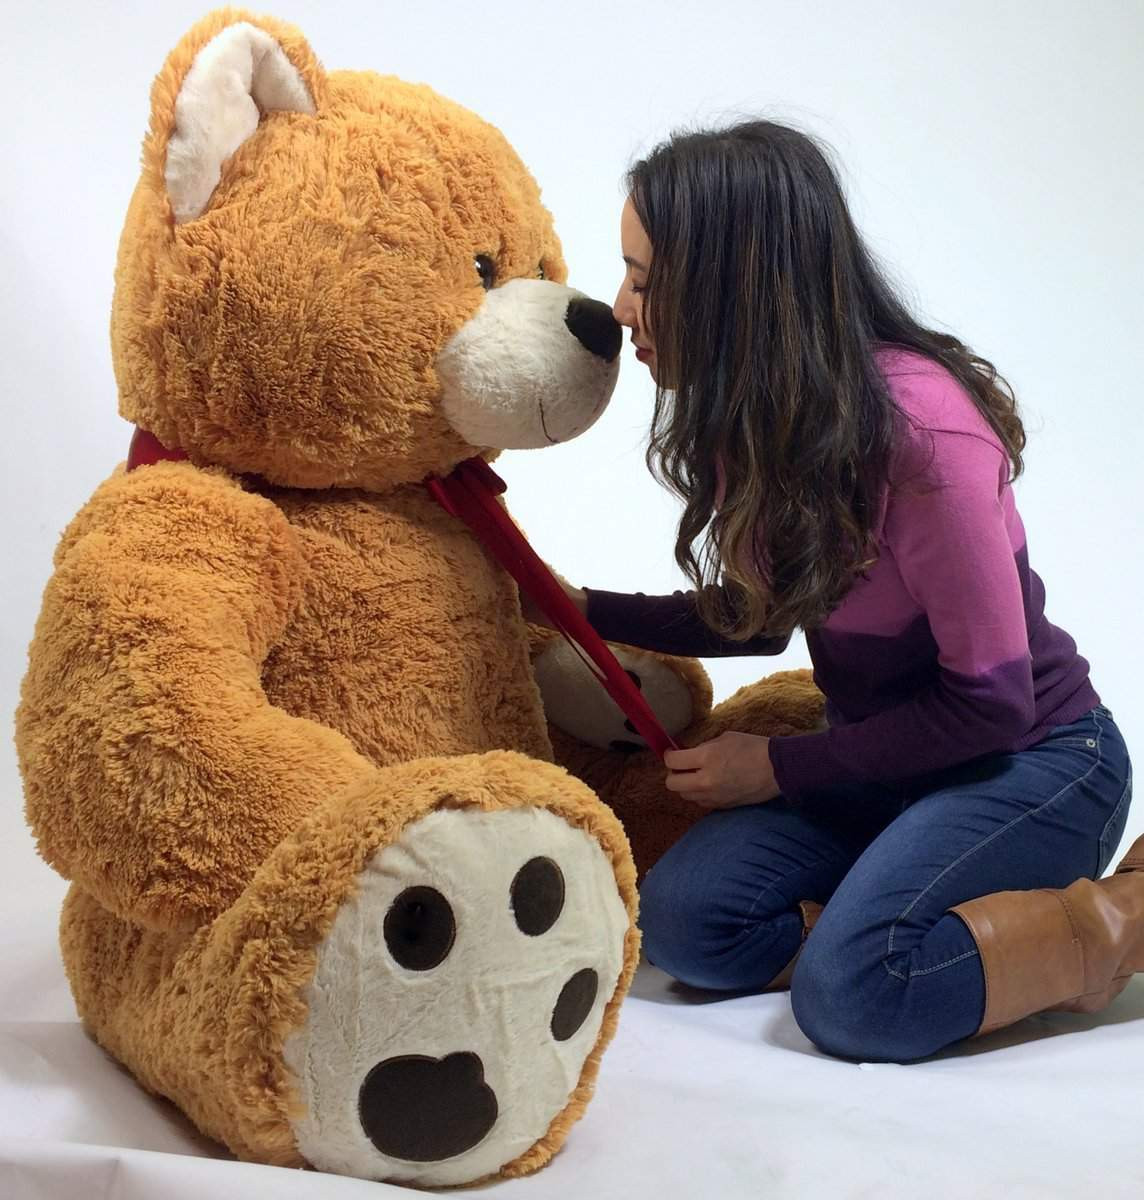 55 Inches Big Plush Smiling Teddy Bear Almost Five Feet Tall Honey